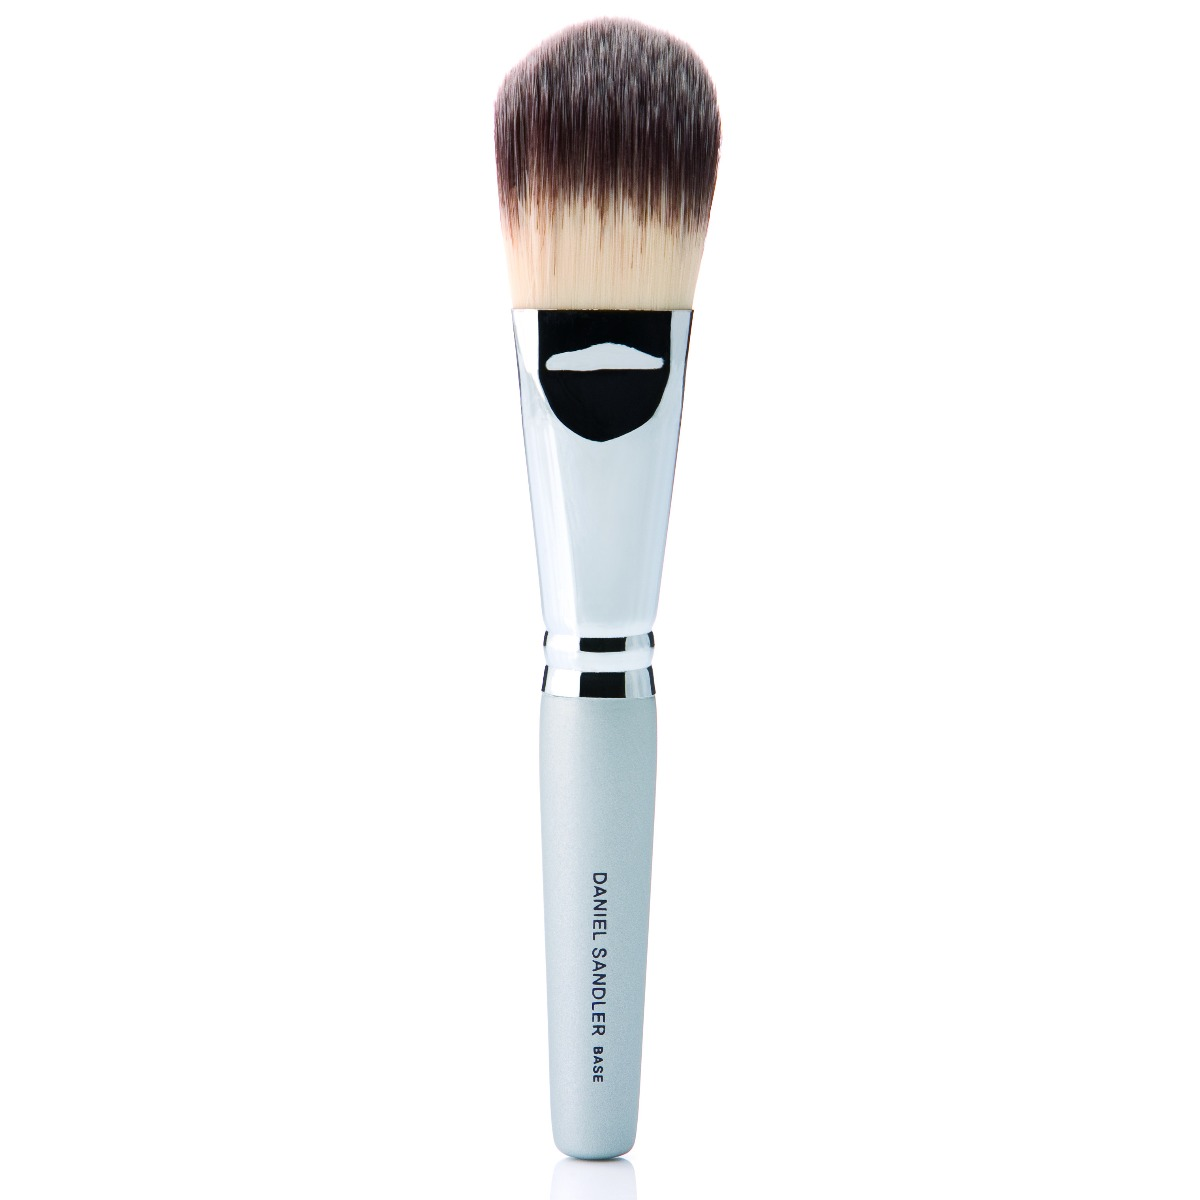 Daniel Sandler Base Brush